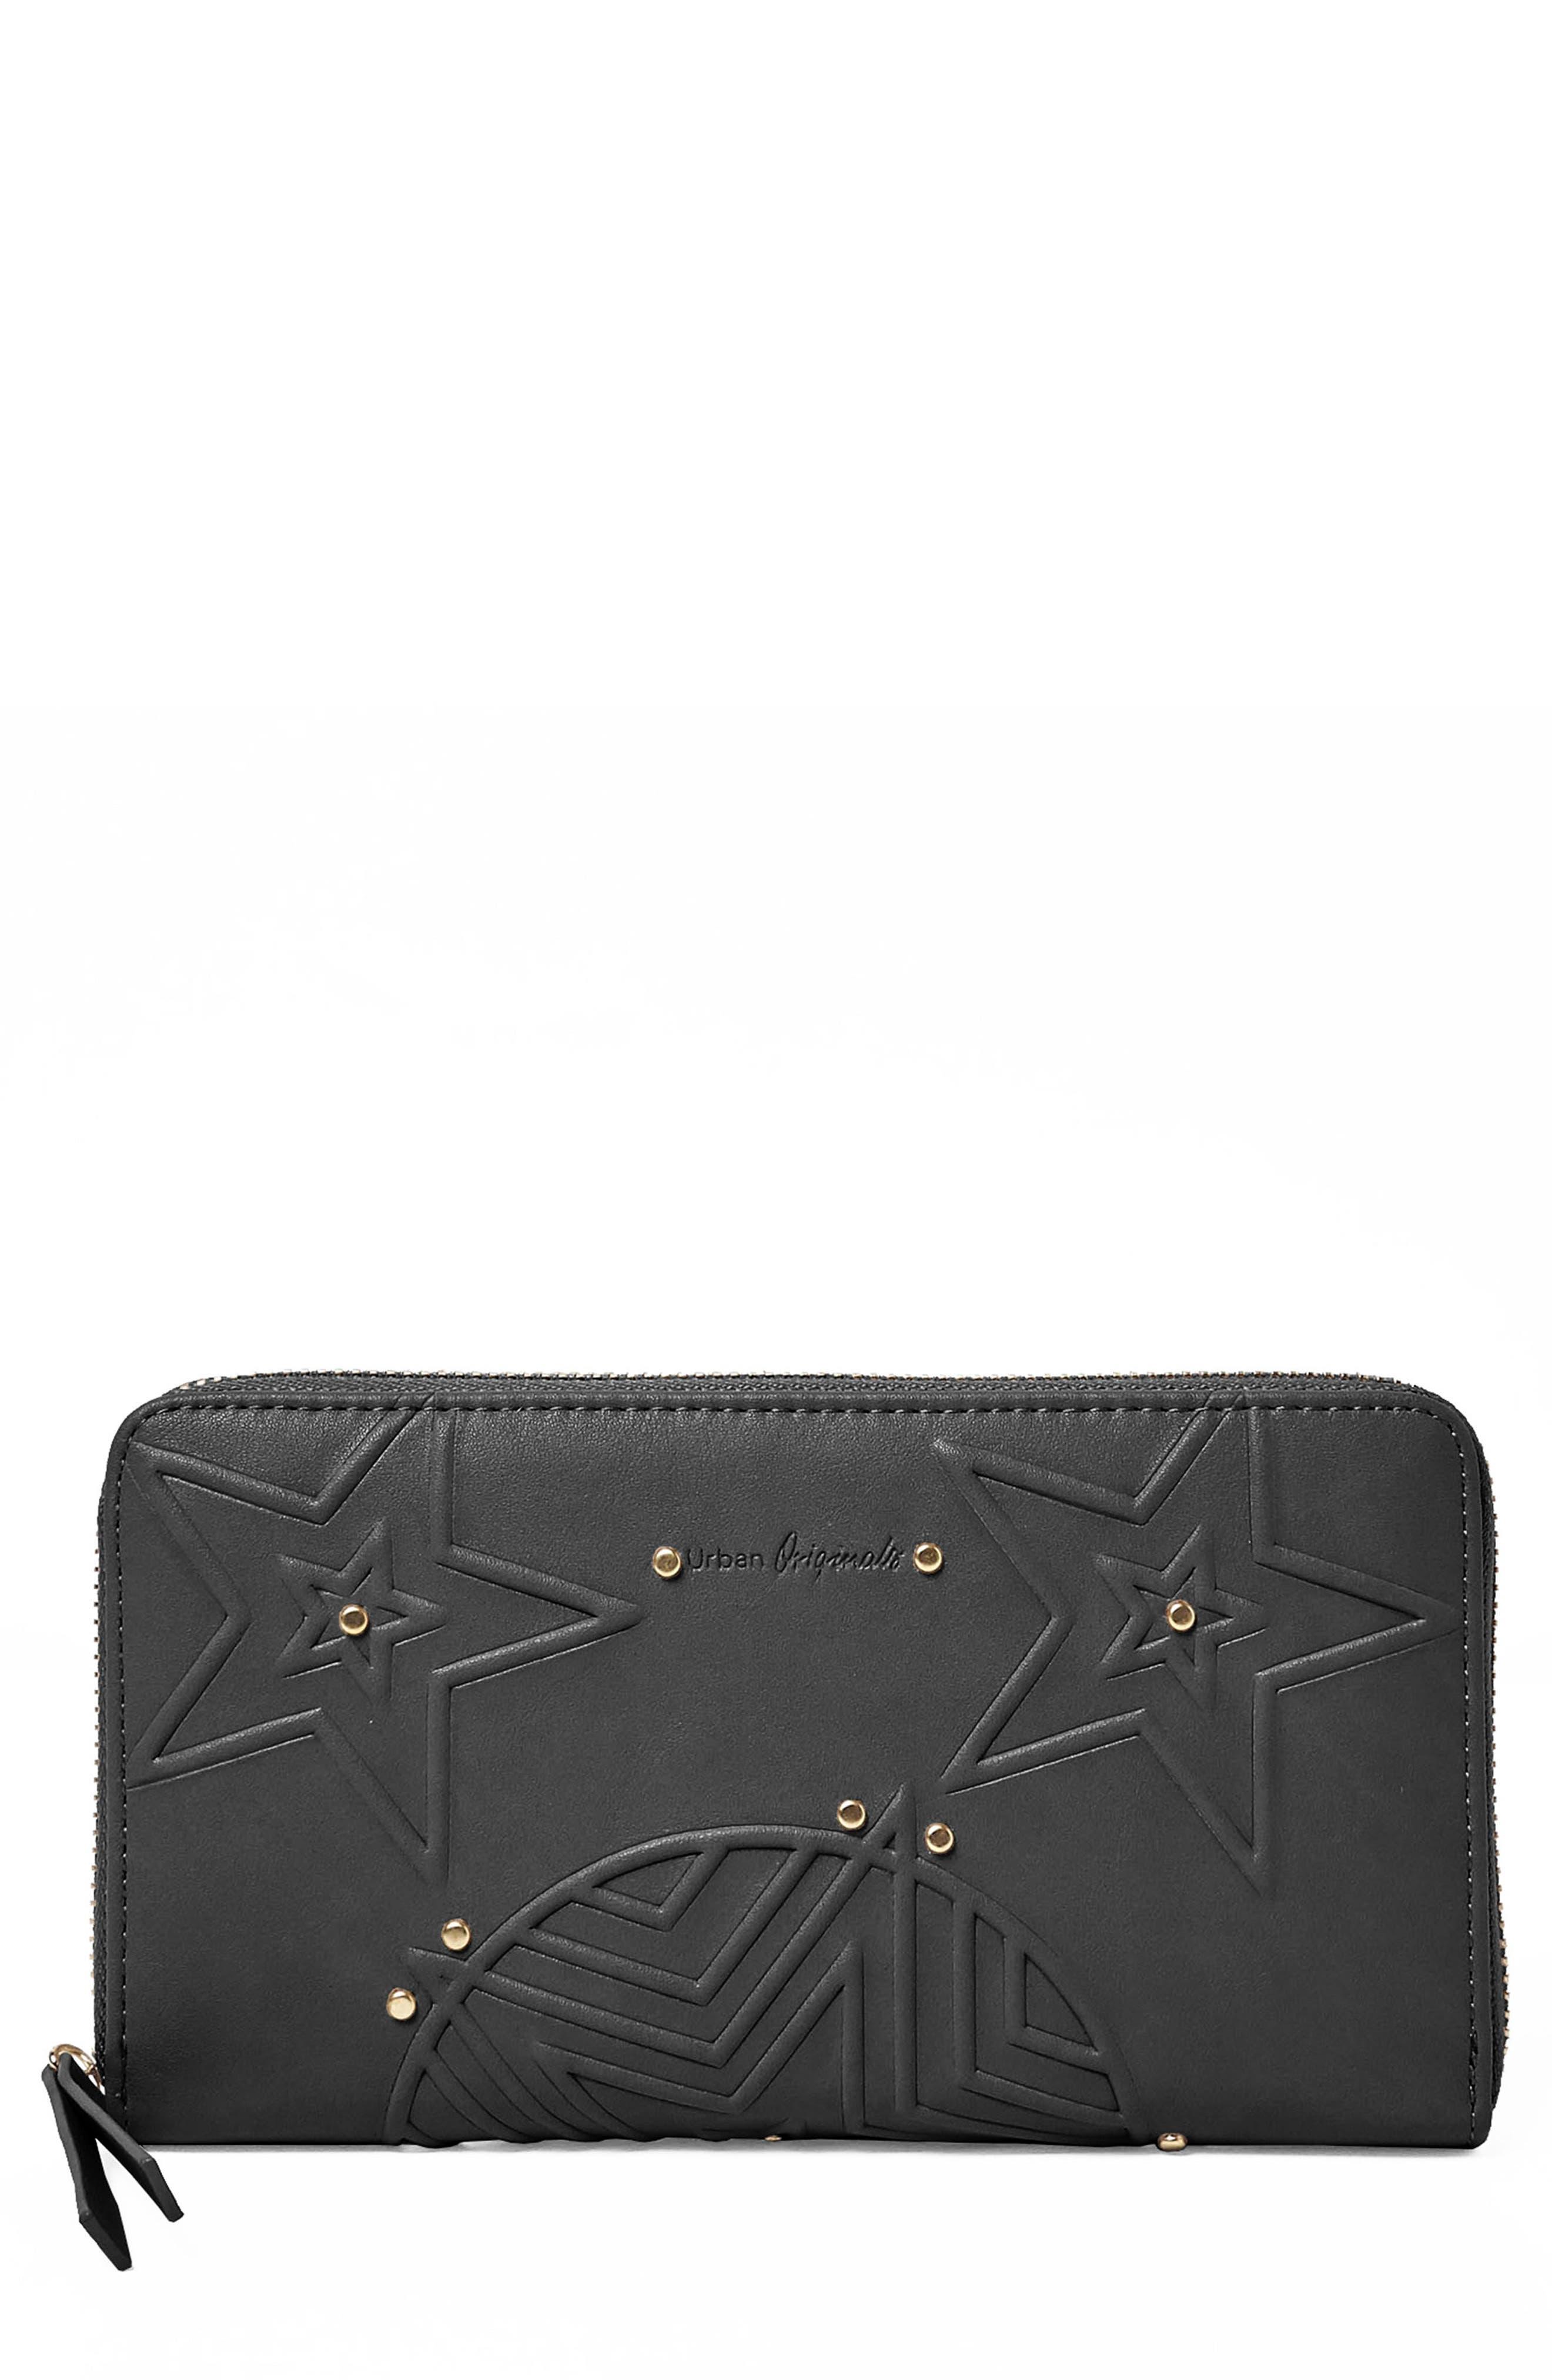 Cosmic Vegan Leather Wallet,                             Main thumbnail 1, color,                             Black